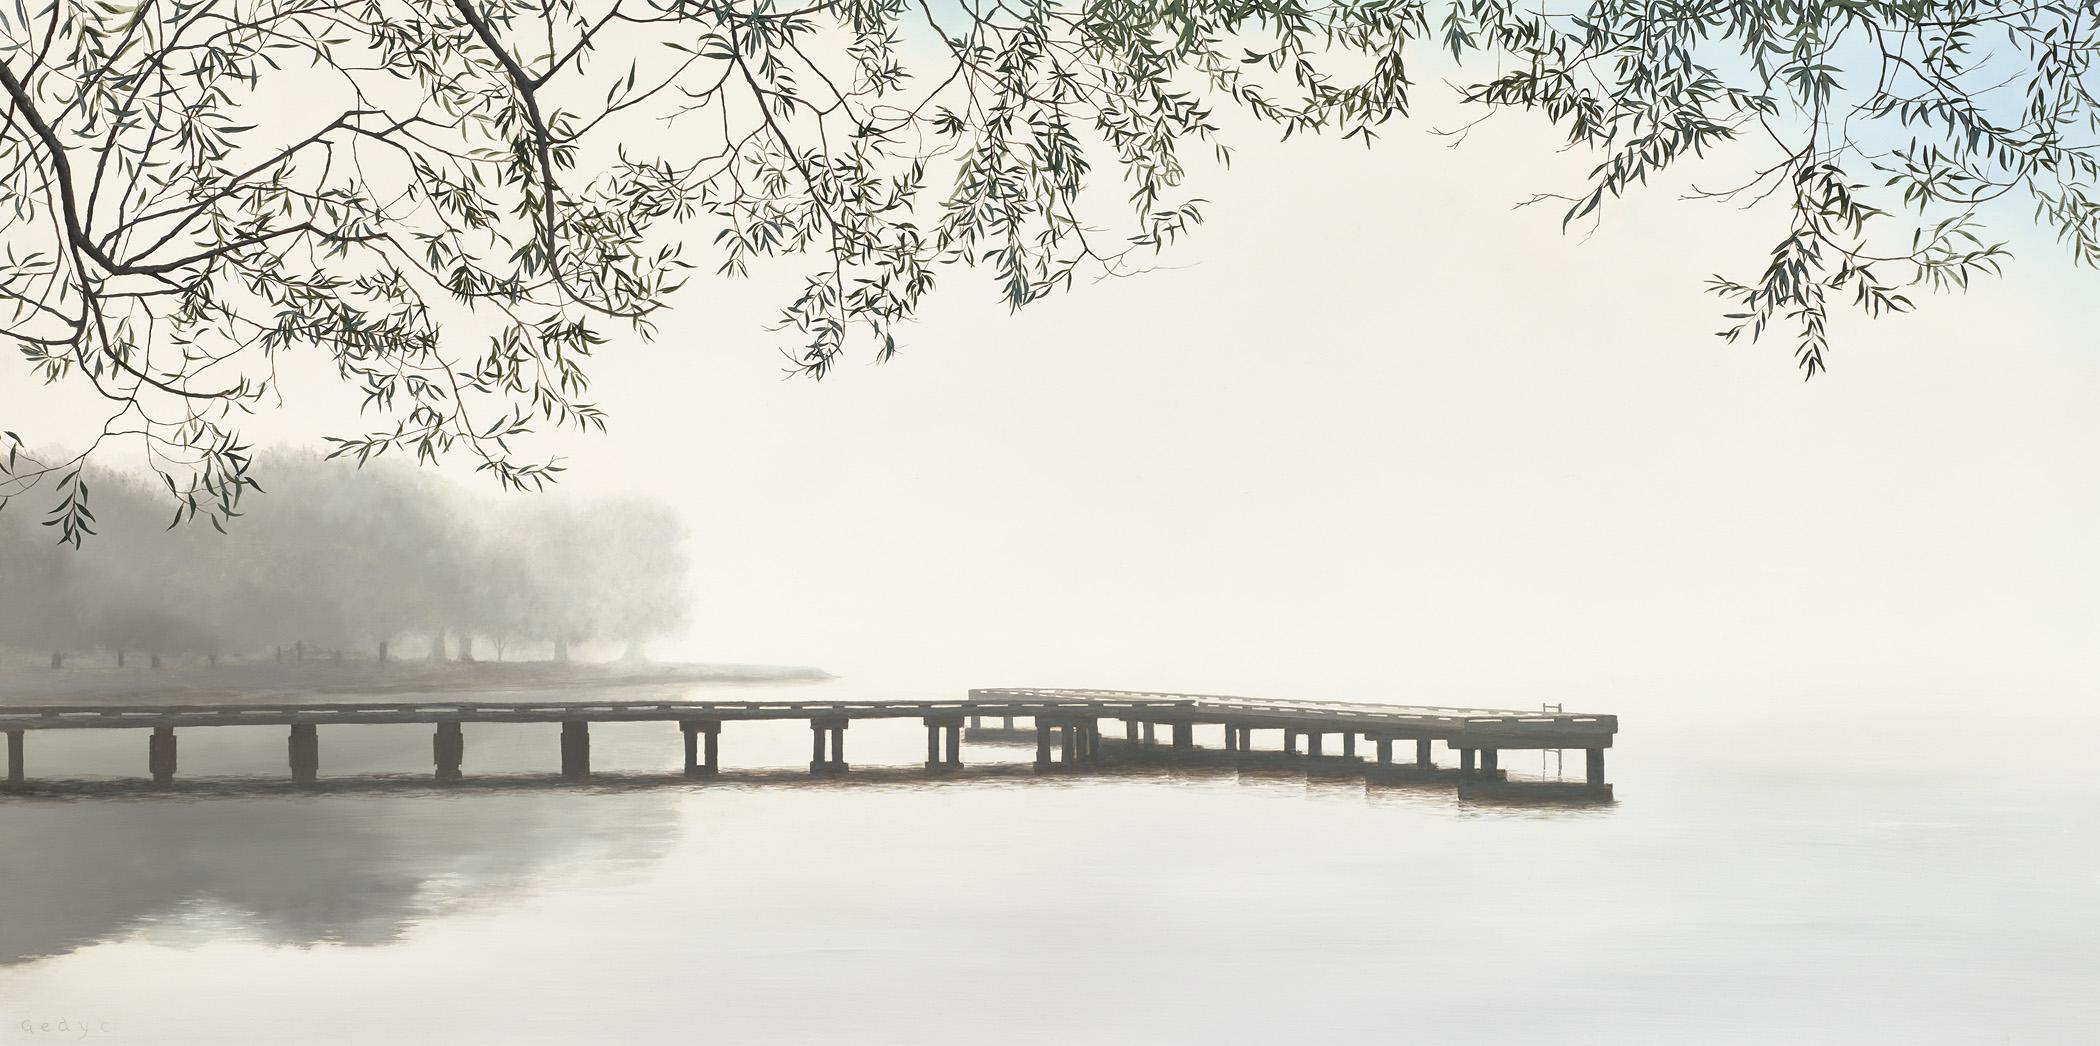 Pier into the Mist